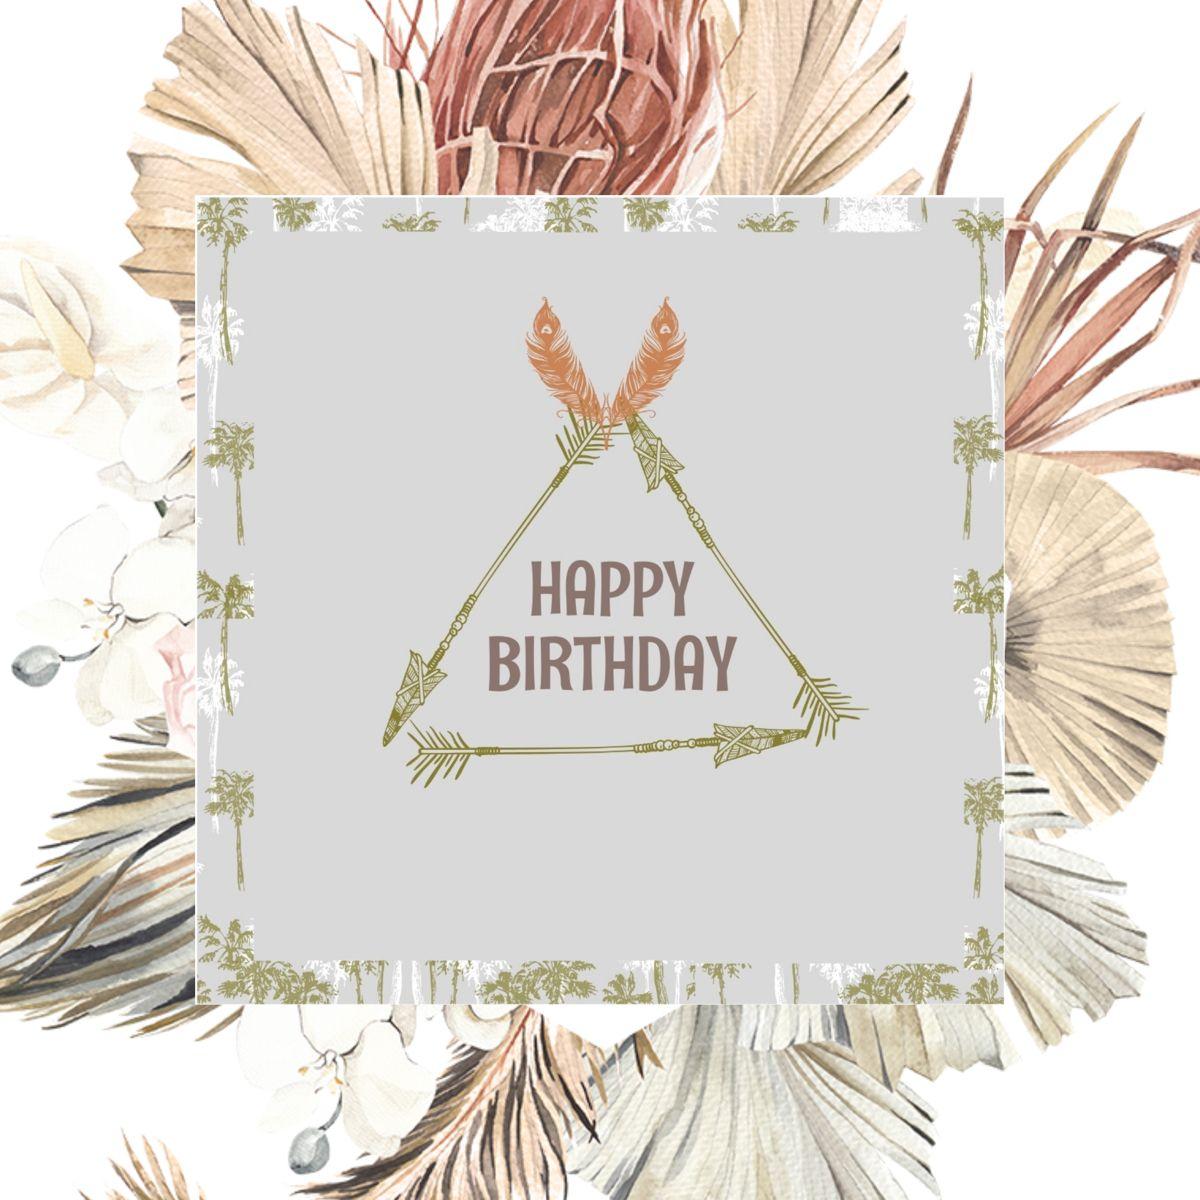 Boho Birthday Card Template Happy Birthday Card Feather Bohemian Arrow Wild Hippie Hipster Greeting Card Digital Fall Birthday In 2021 Birthday Card Template Happy Birthday Greeting Card Digital Birthday Cards